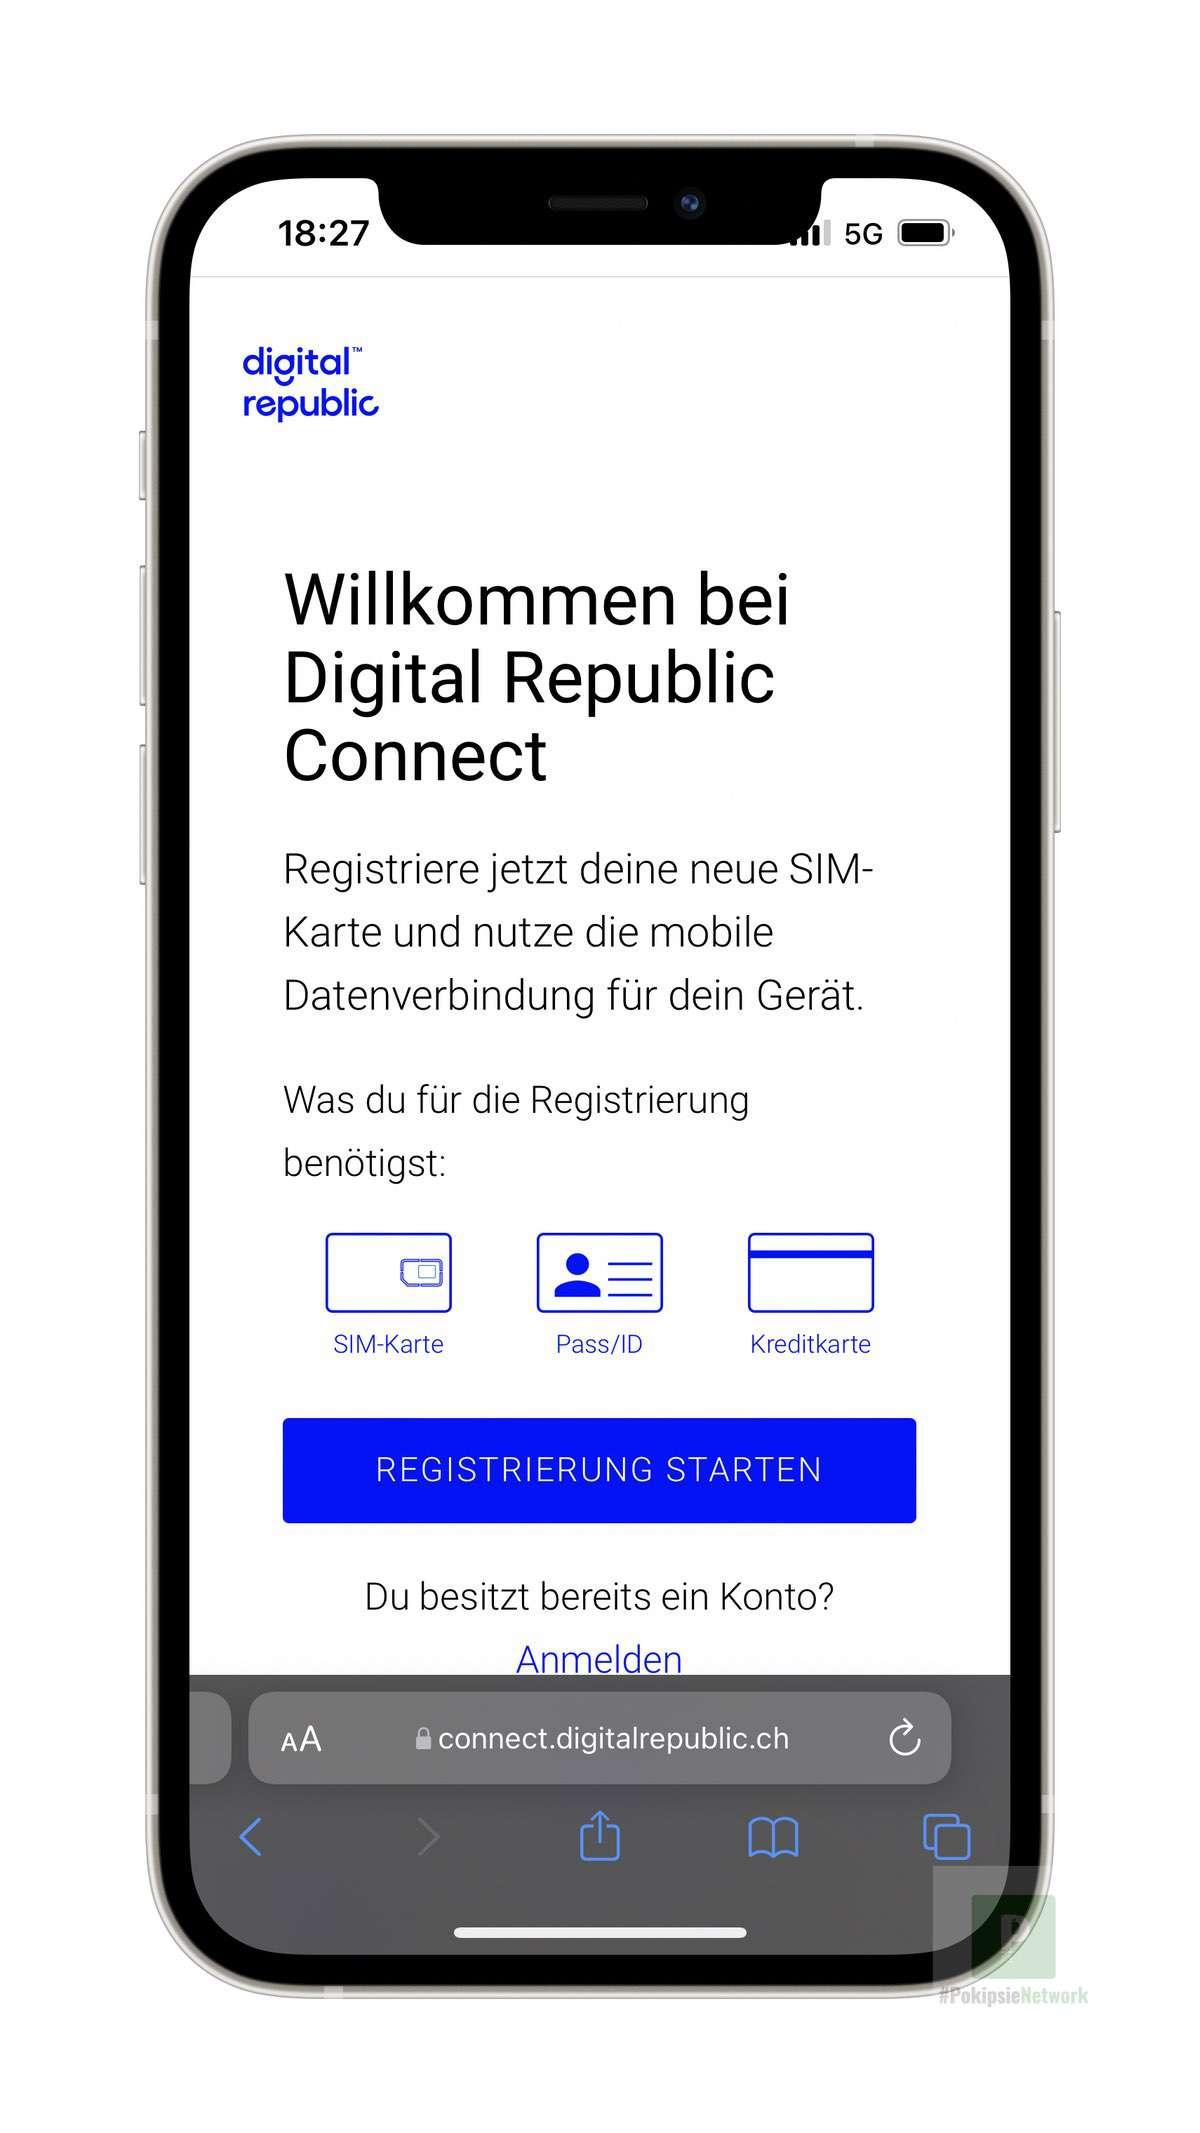 Digital Republic - Registrieren